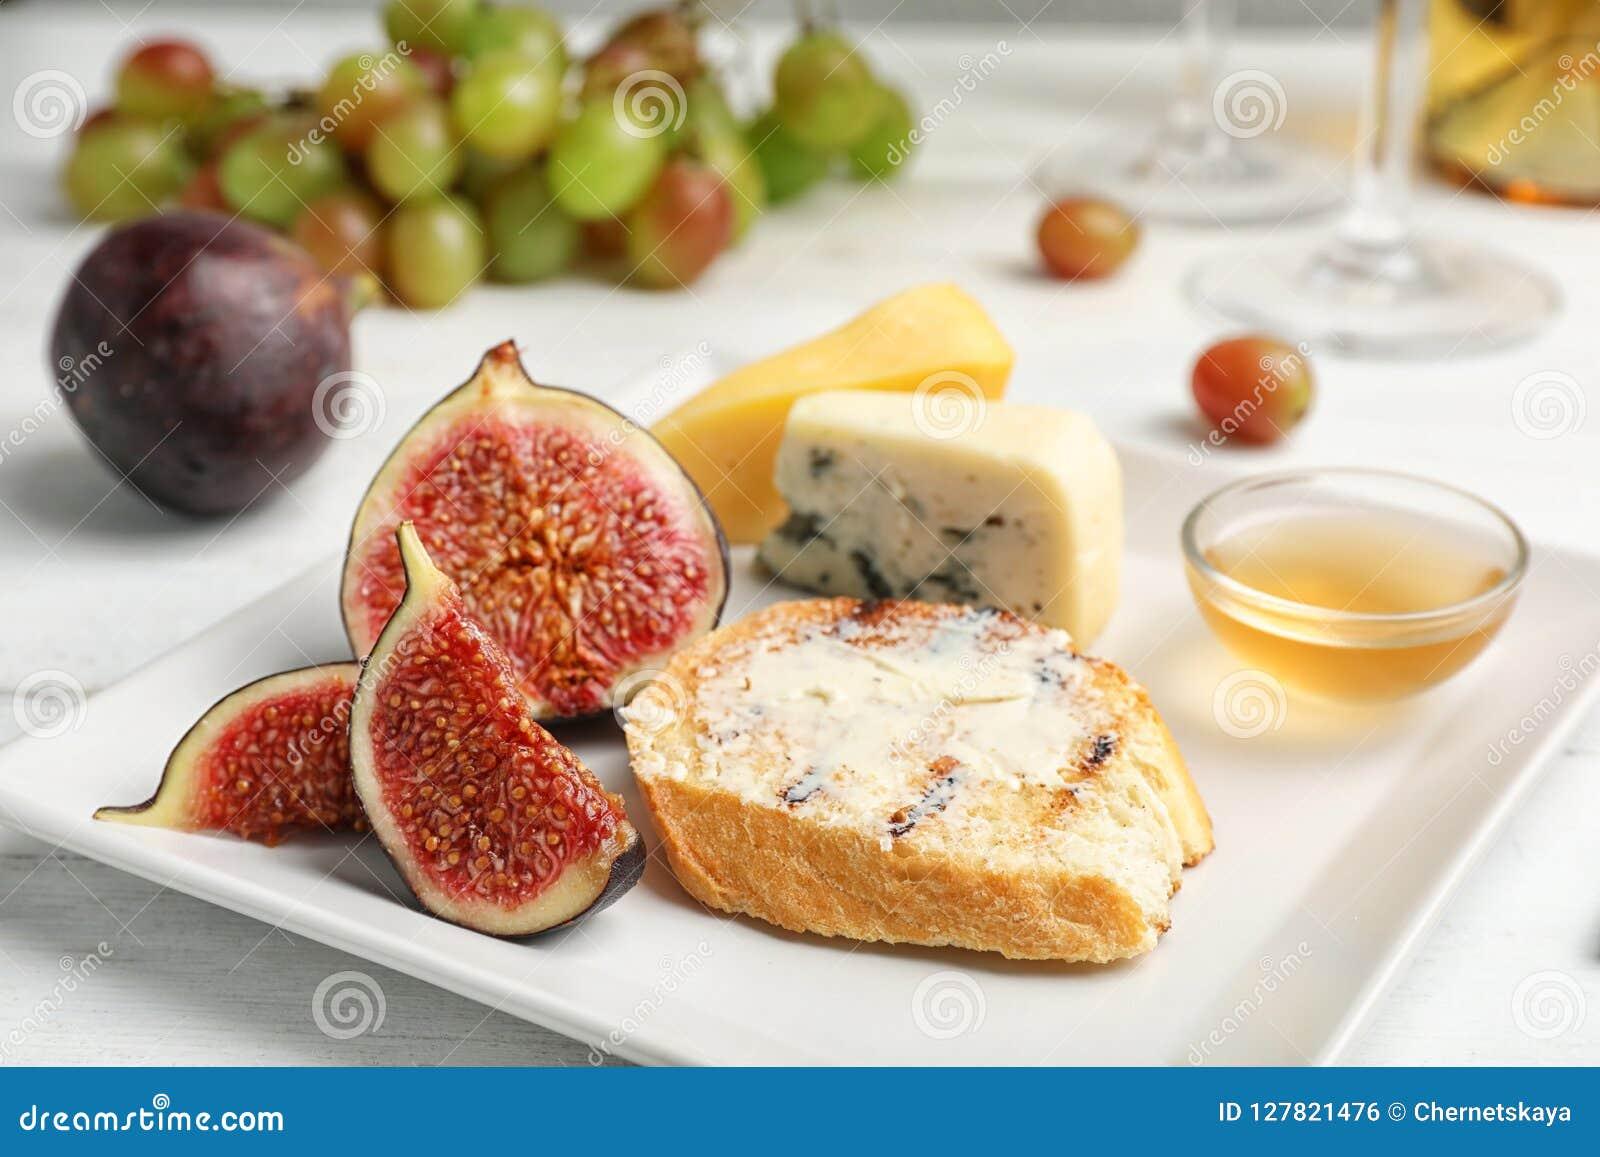 Dojrzałe figi i plasterek chleb z masłem